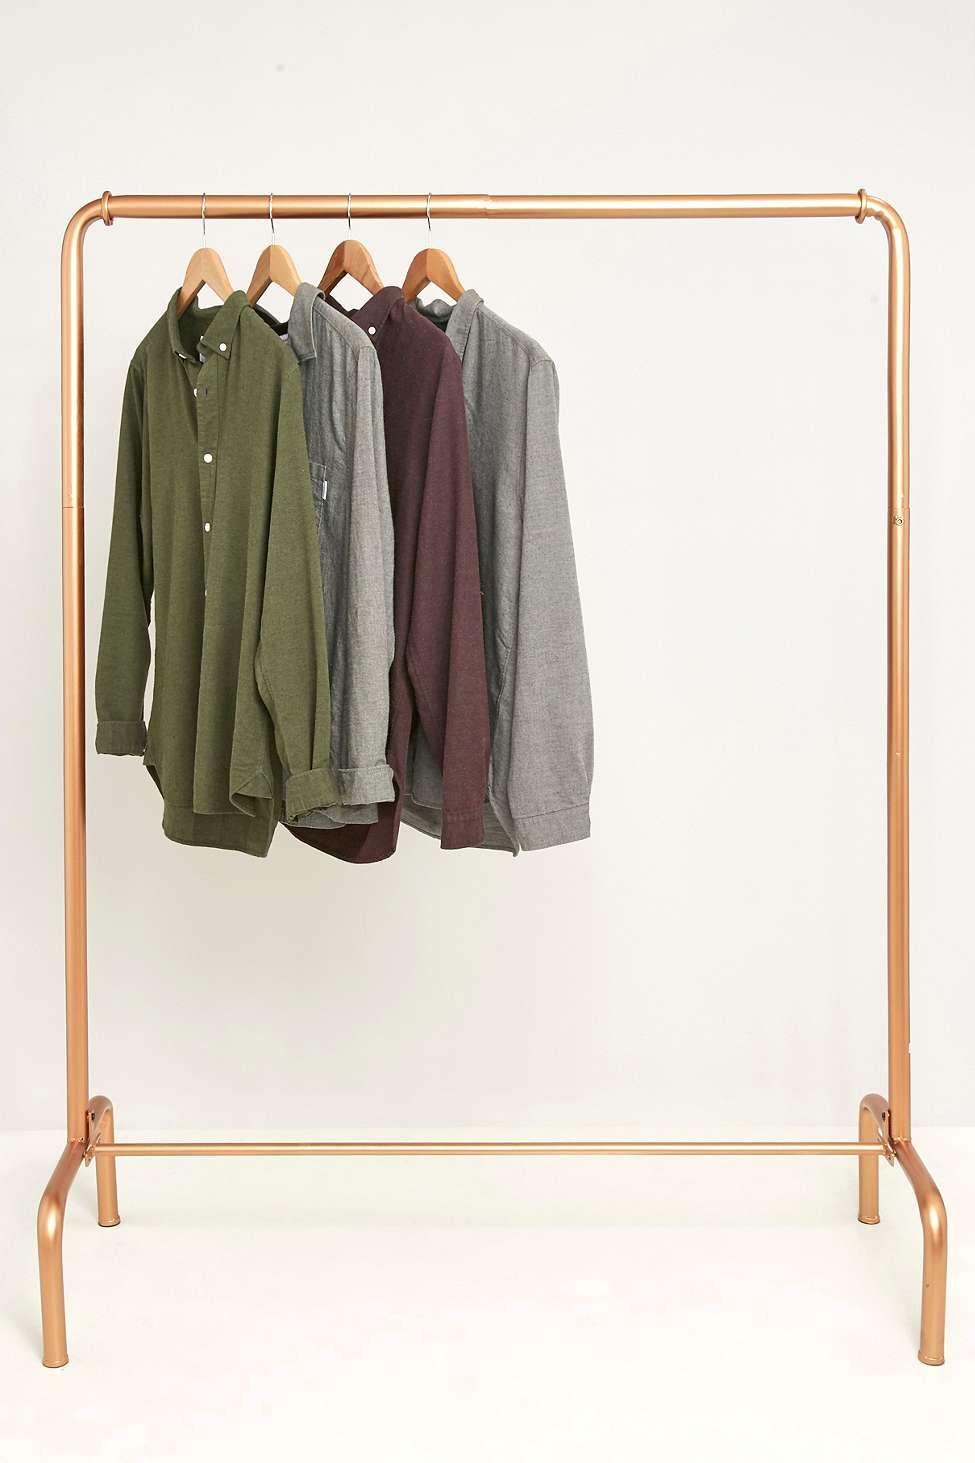 Gold Rail Clothing Rack Clothing Rack Clothes Rail Rails Clothing